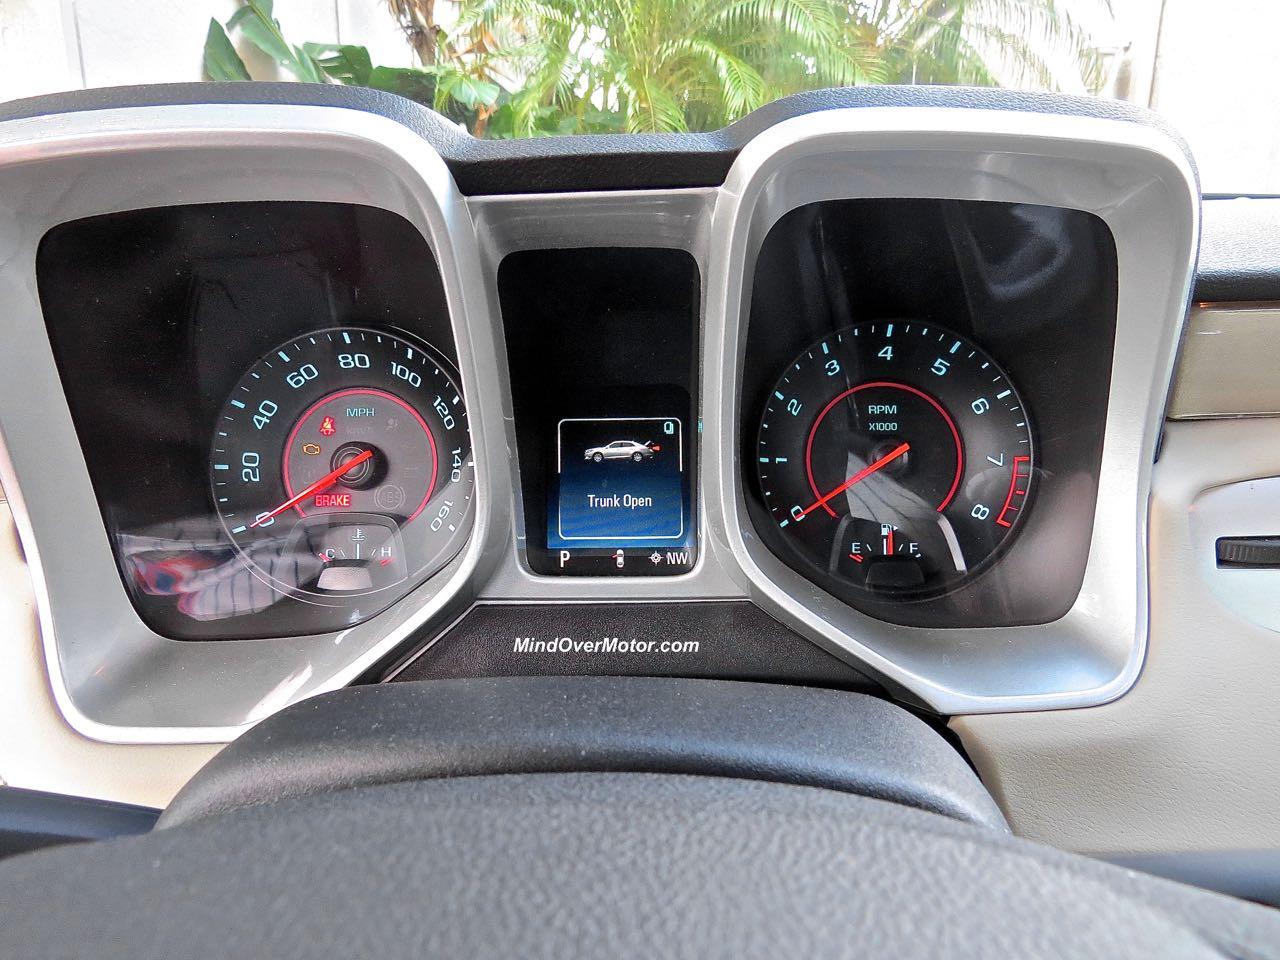 2015 Chevrolet Camaro Convertible Instrument Panel